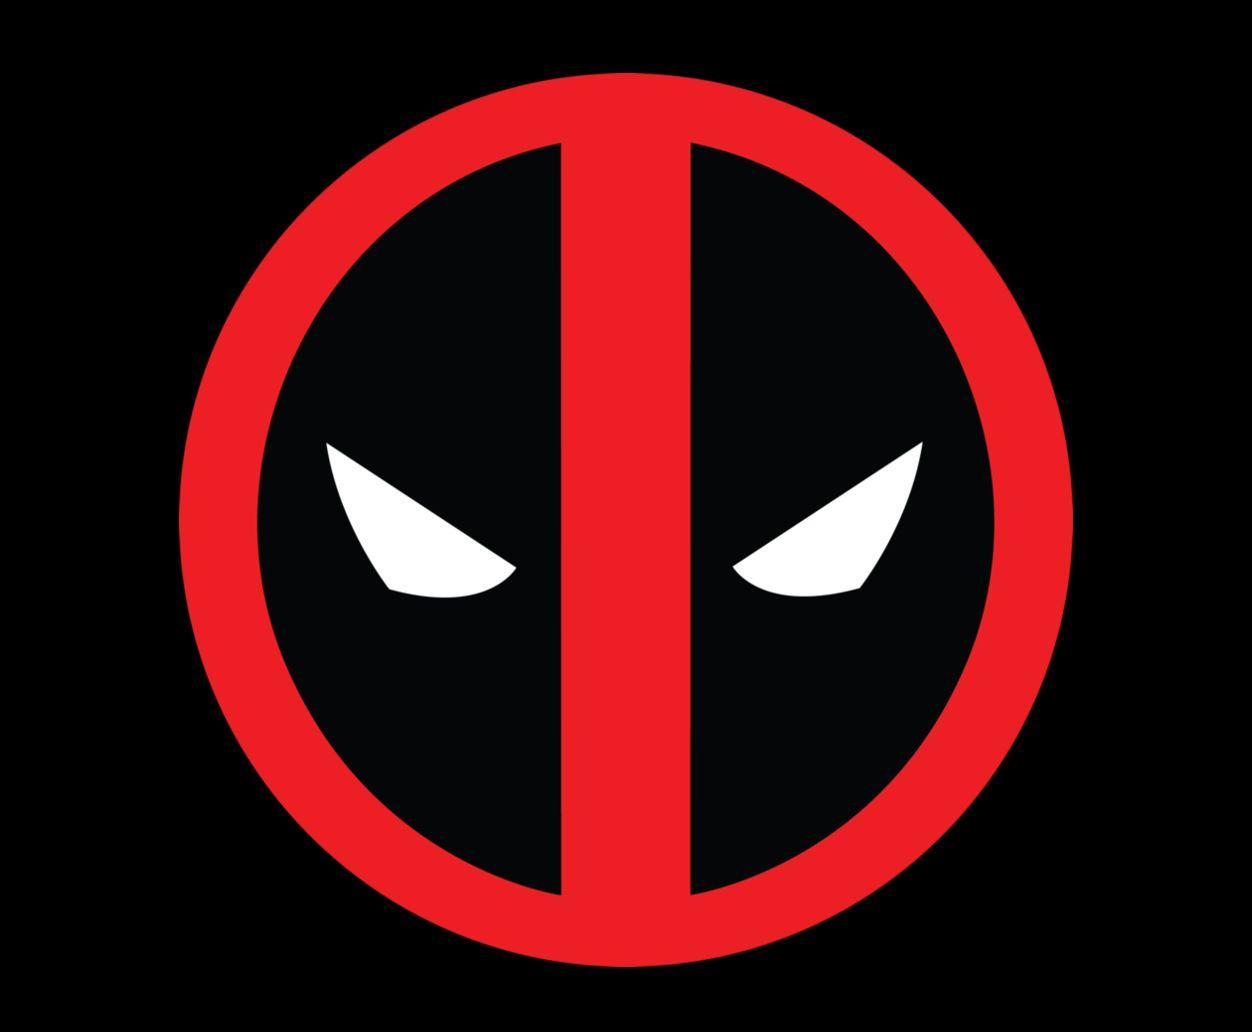 Symbol Deadpool Deadpool Logo Deadpool Artwork Deadpool Wallpaper